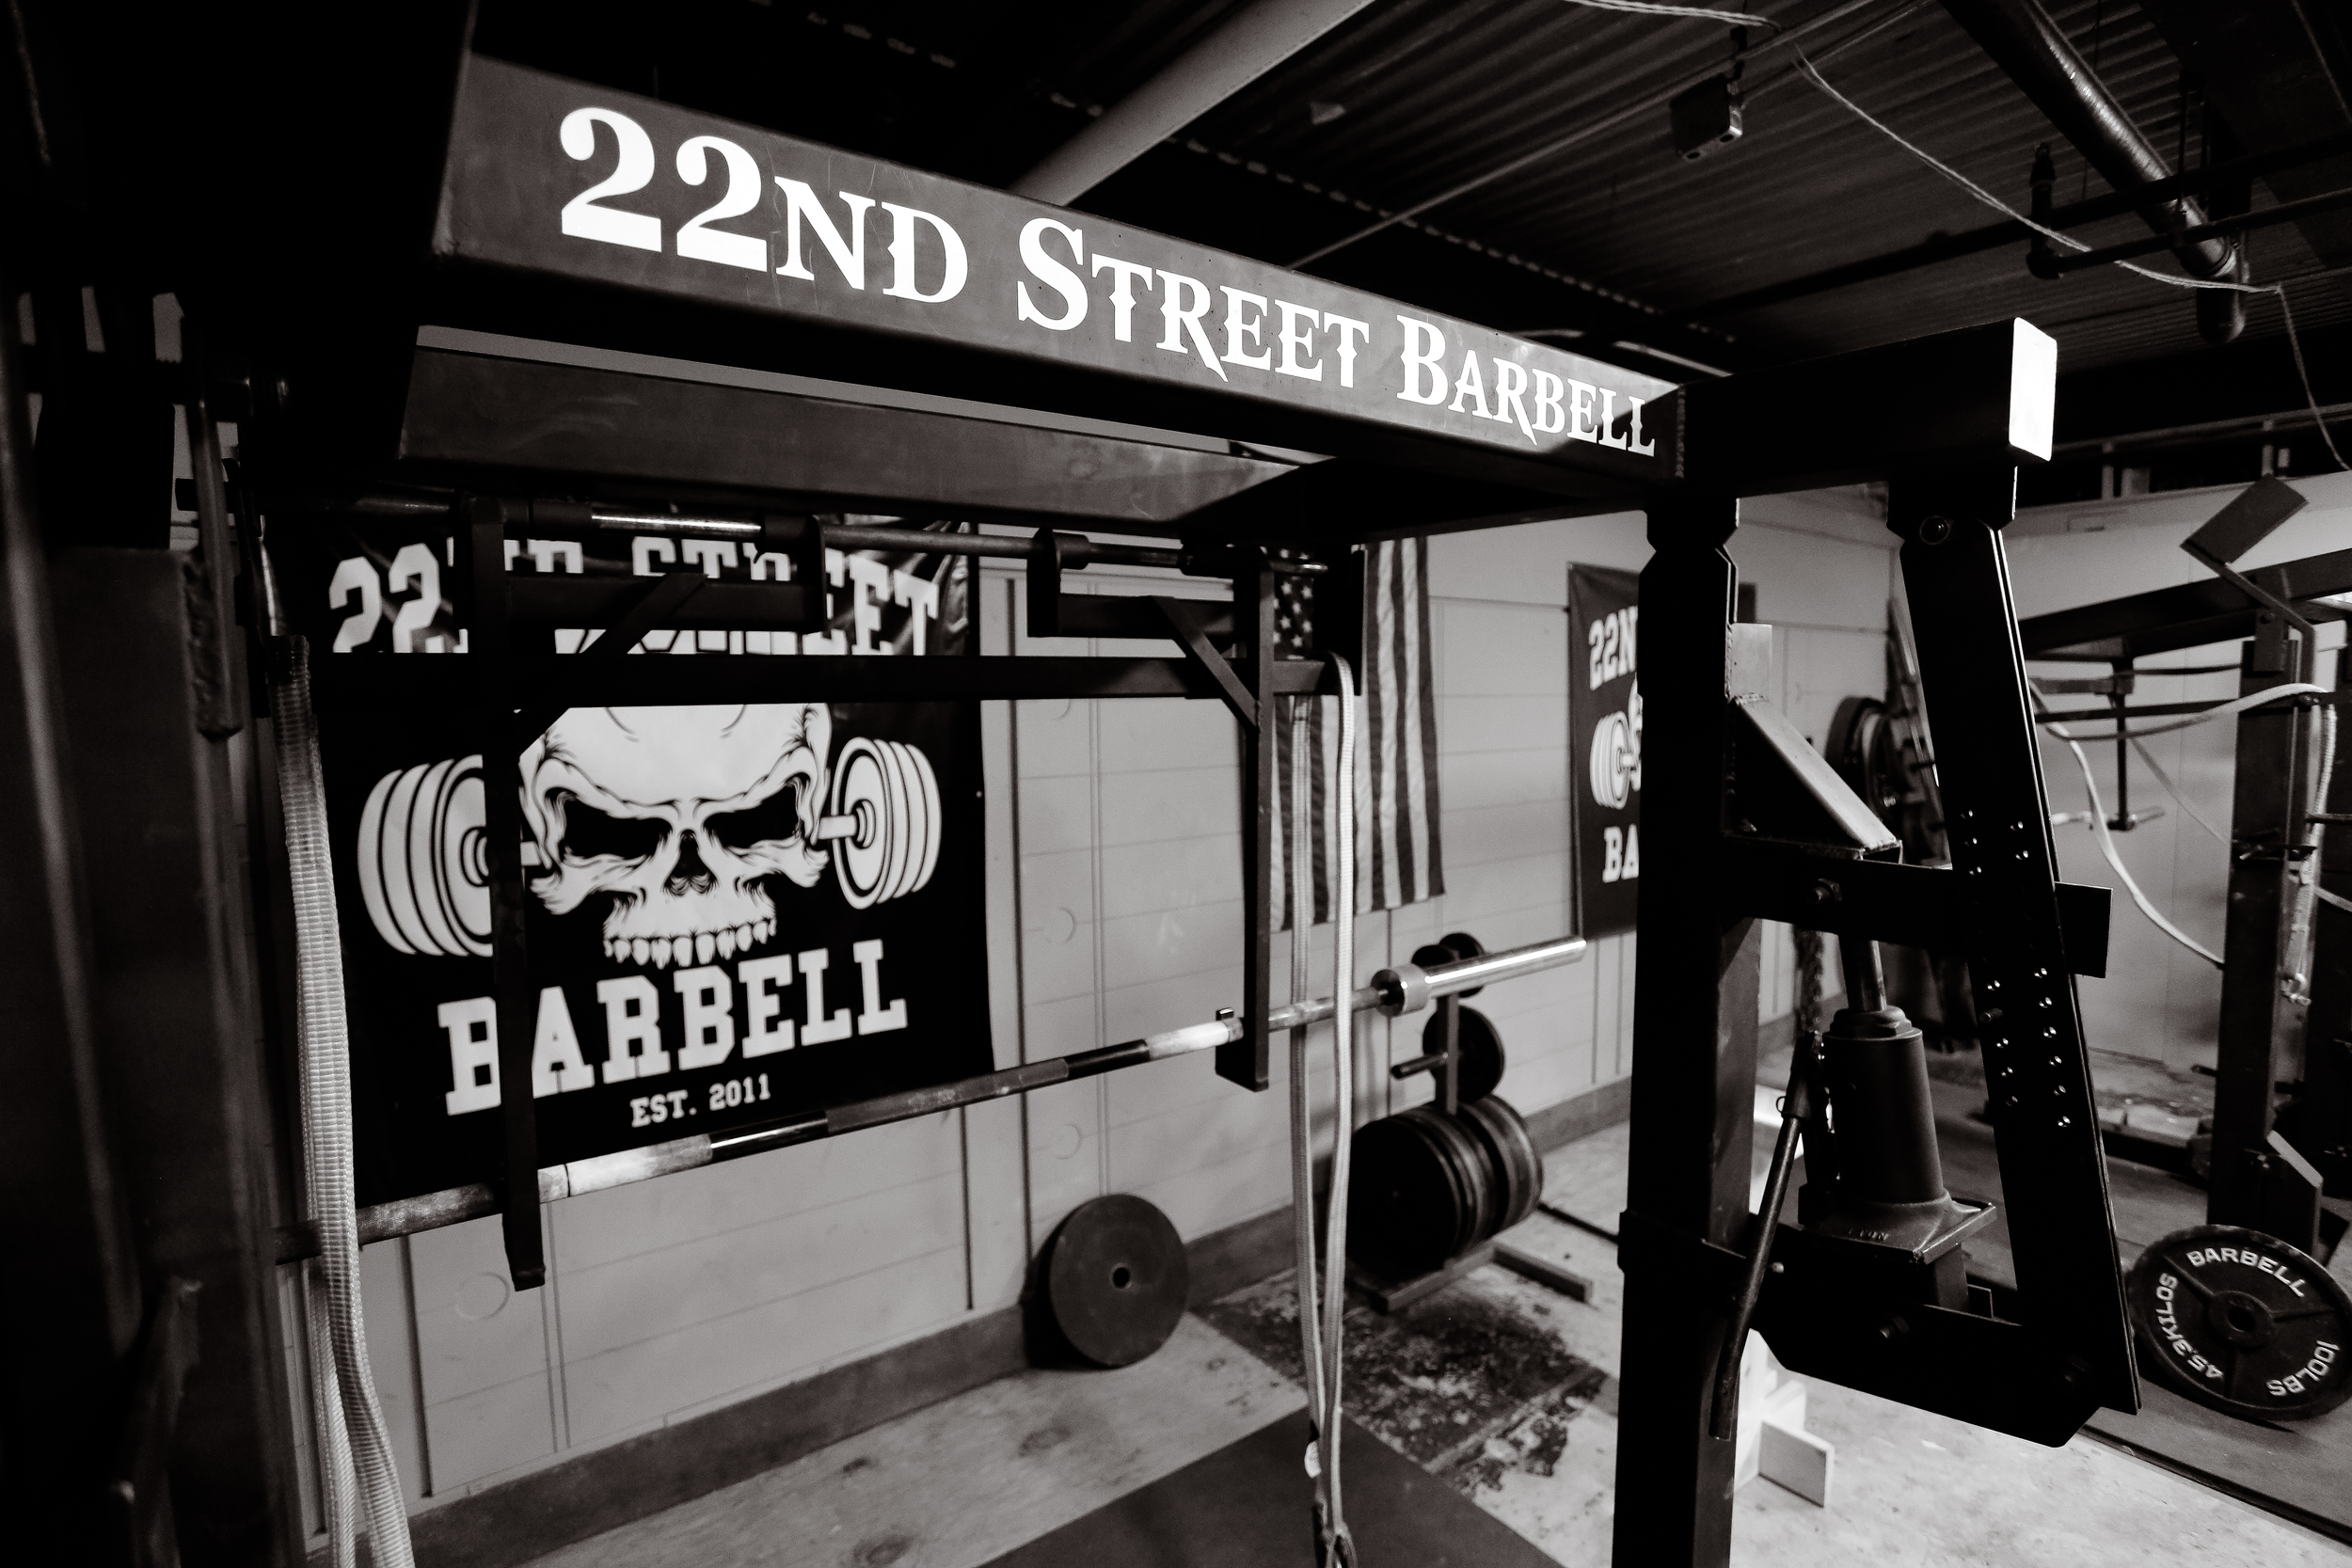 22nd Street Barbell